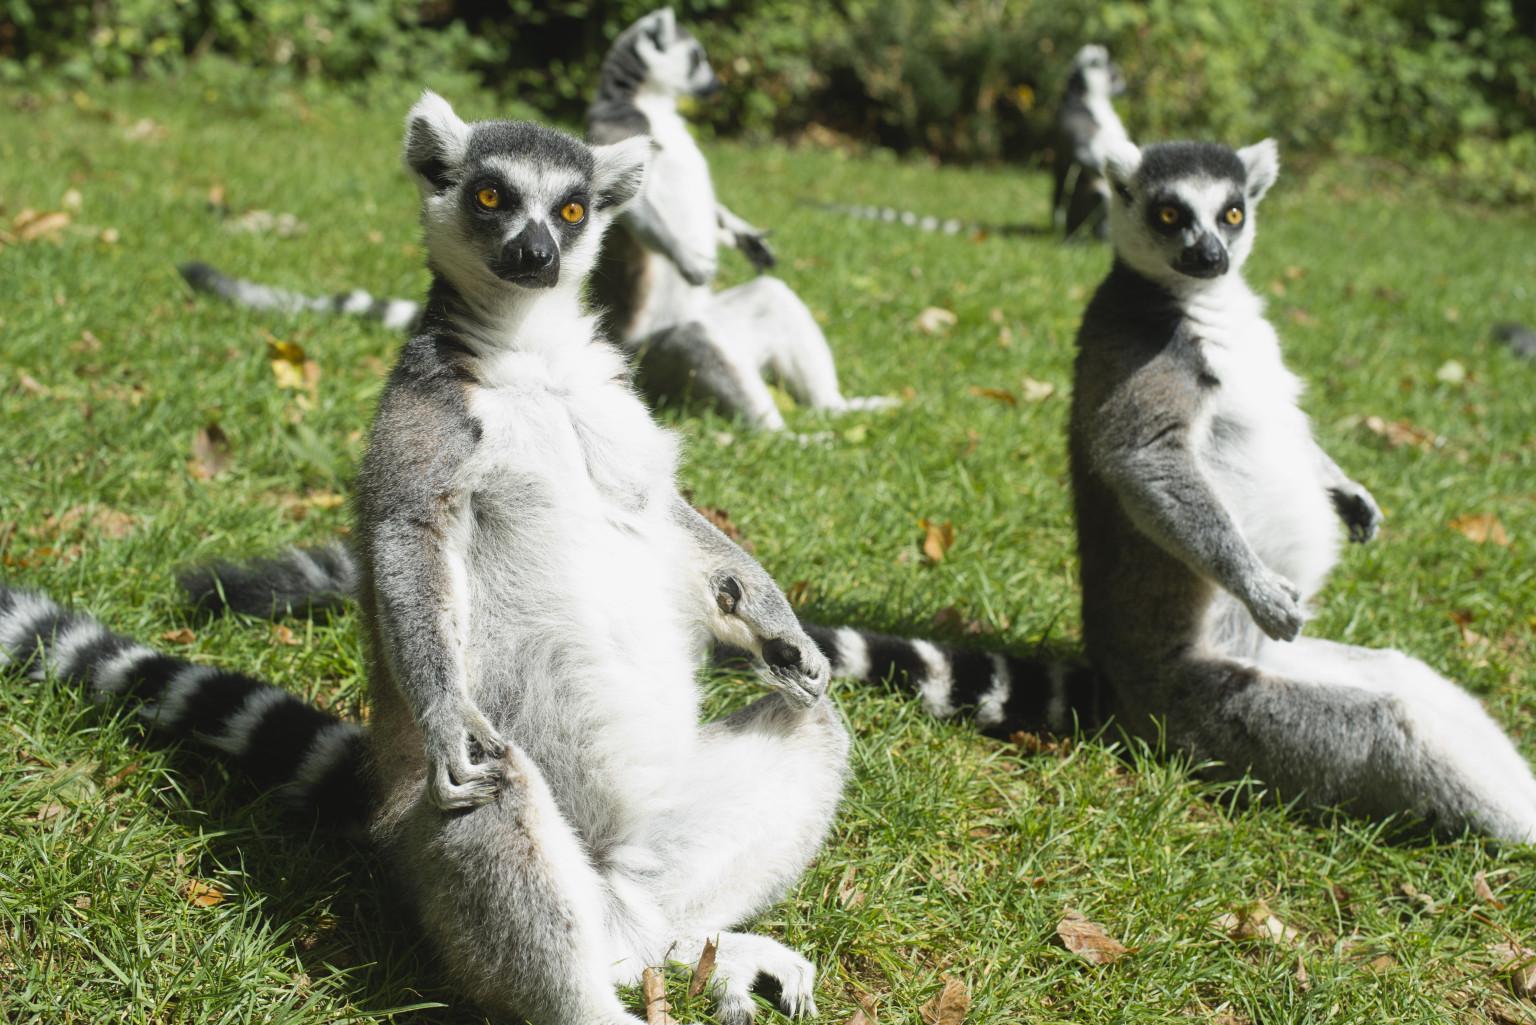 Lemurs Intelligence Street Smarts May Be More